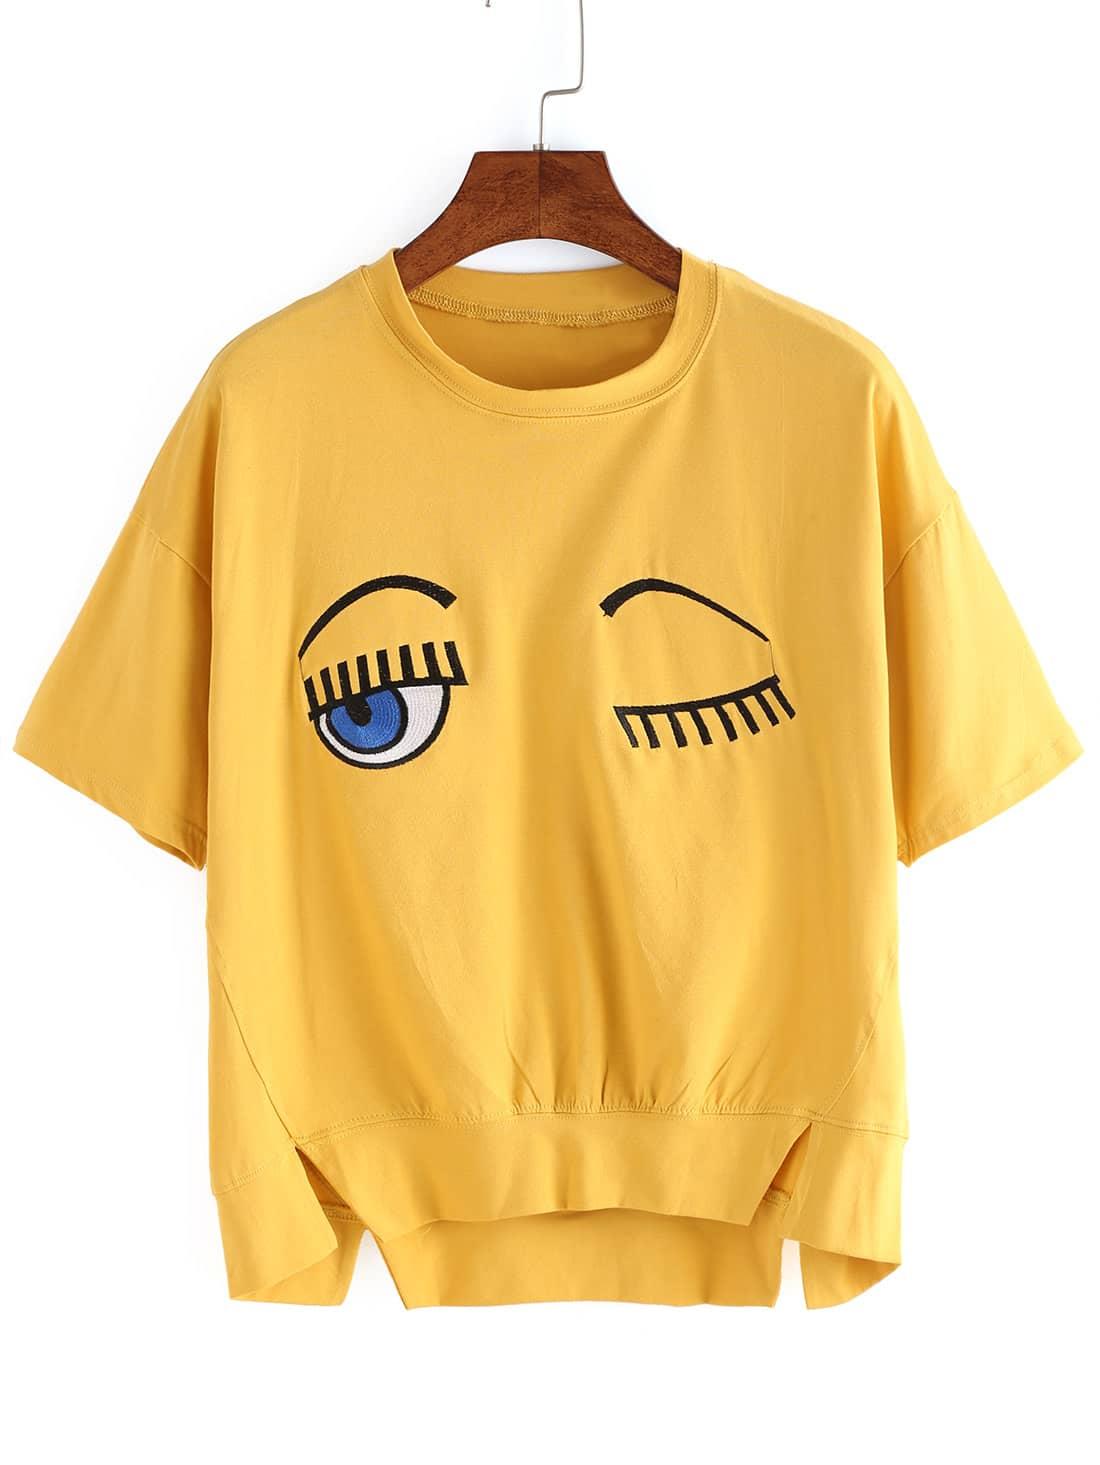 Dip Hem Eye Embroidered Split T-shirtDip Hem Eye Embroidered Split T-shirt<br><br>color: Yellow<br>size: one-size